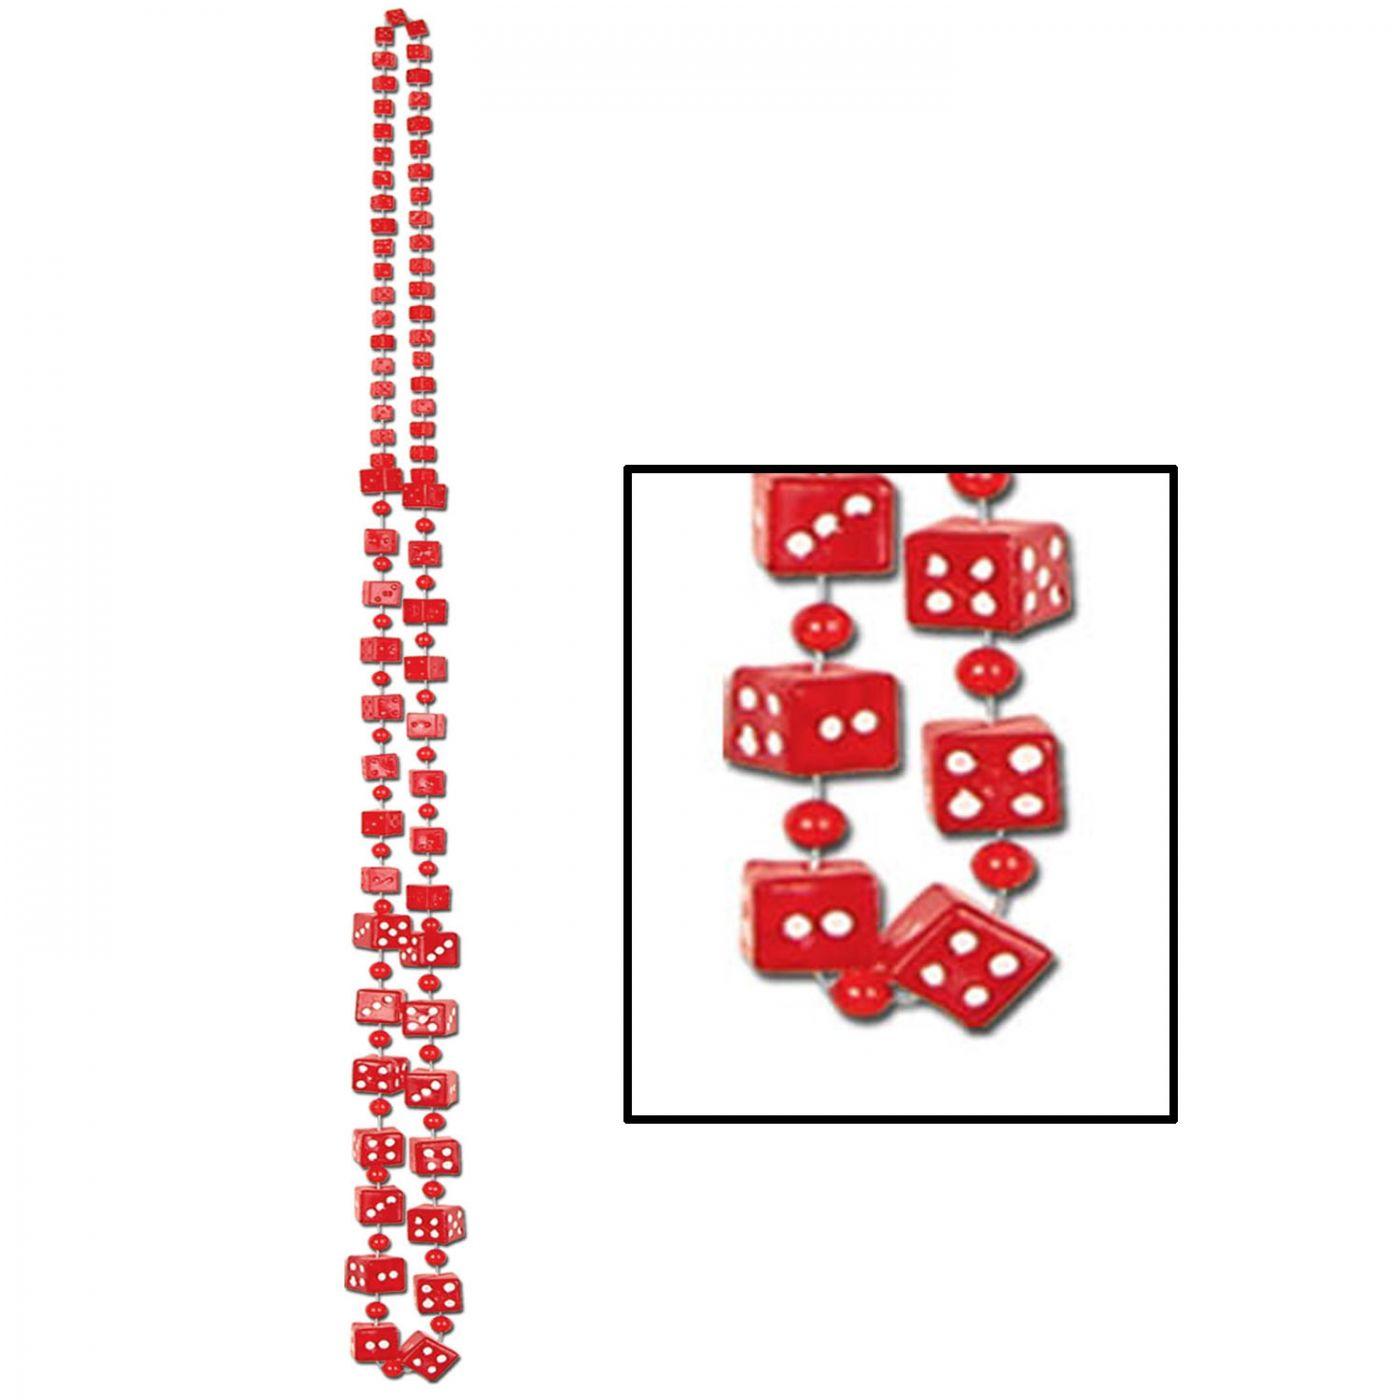 Dice Beads image